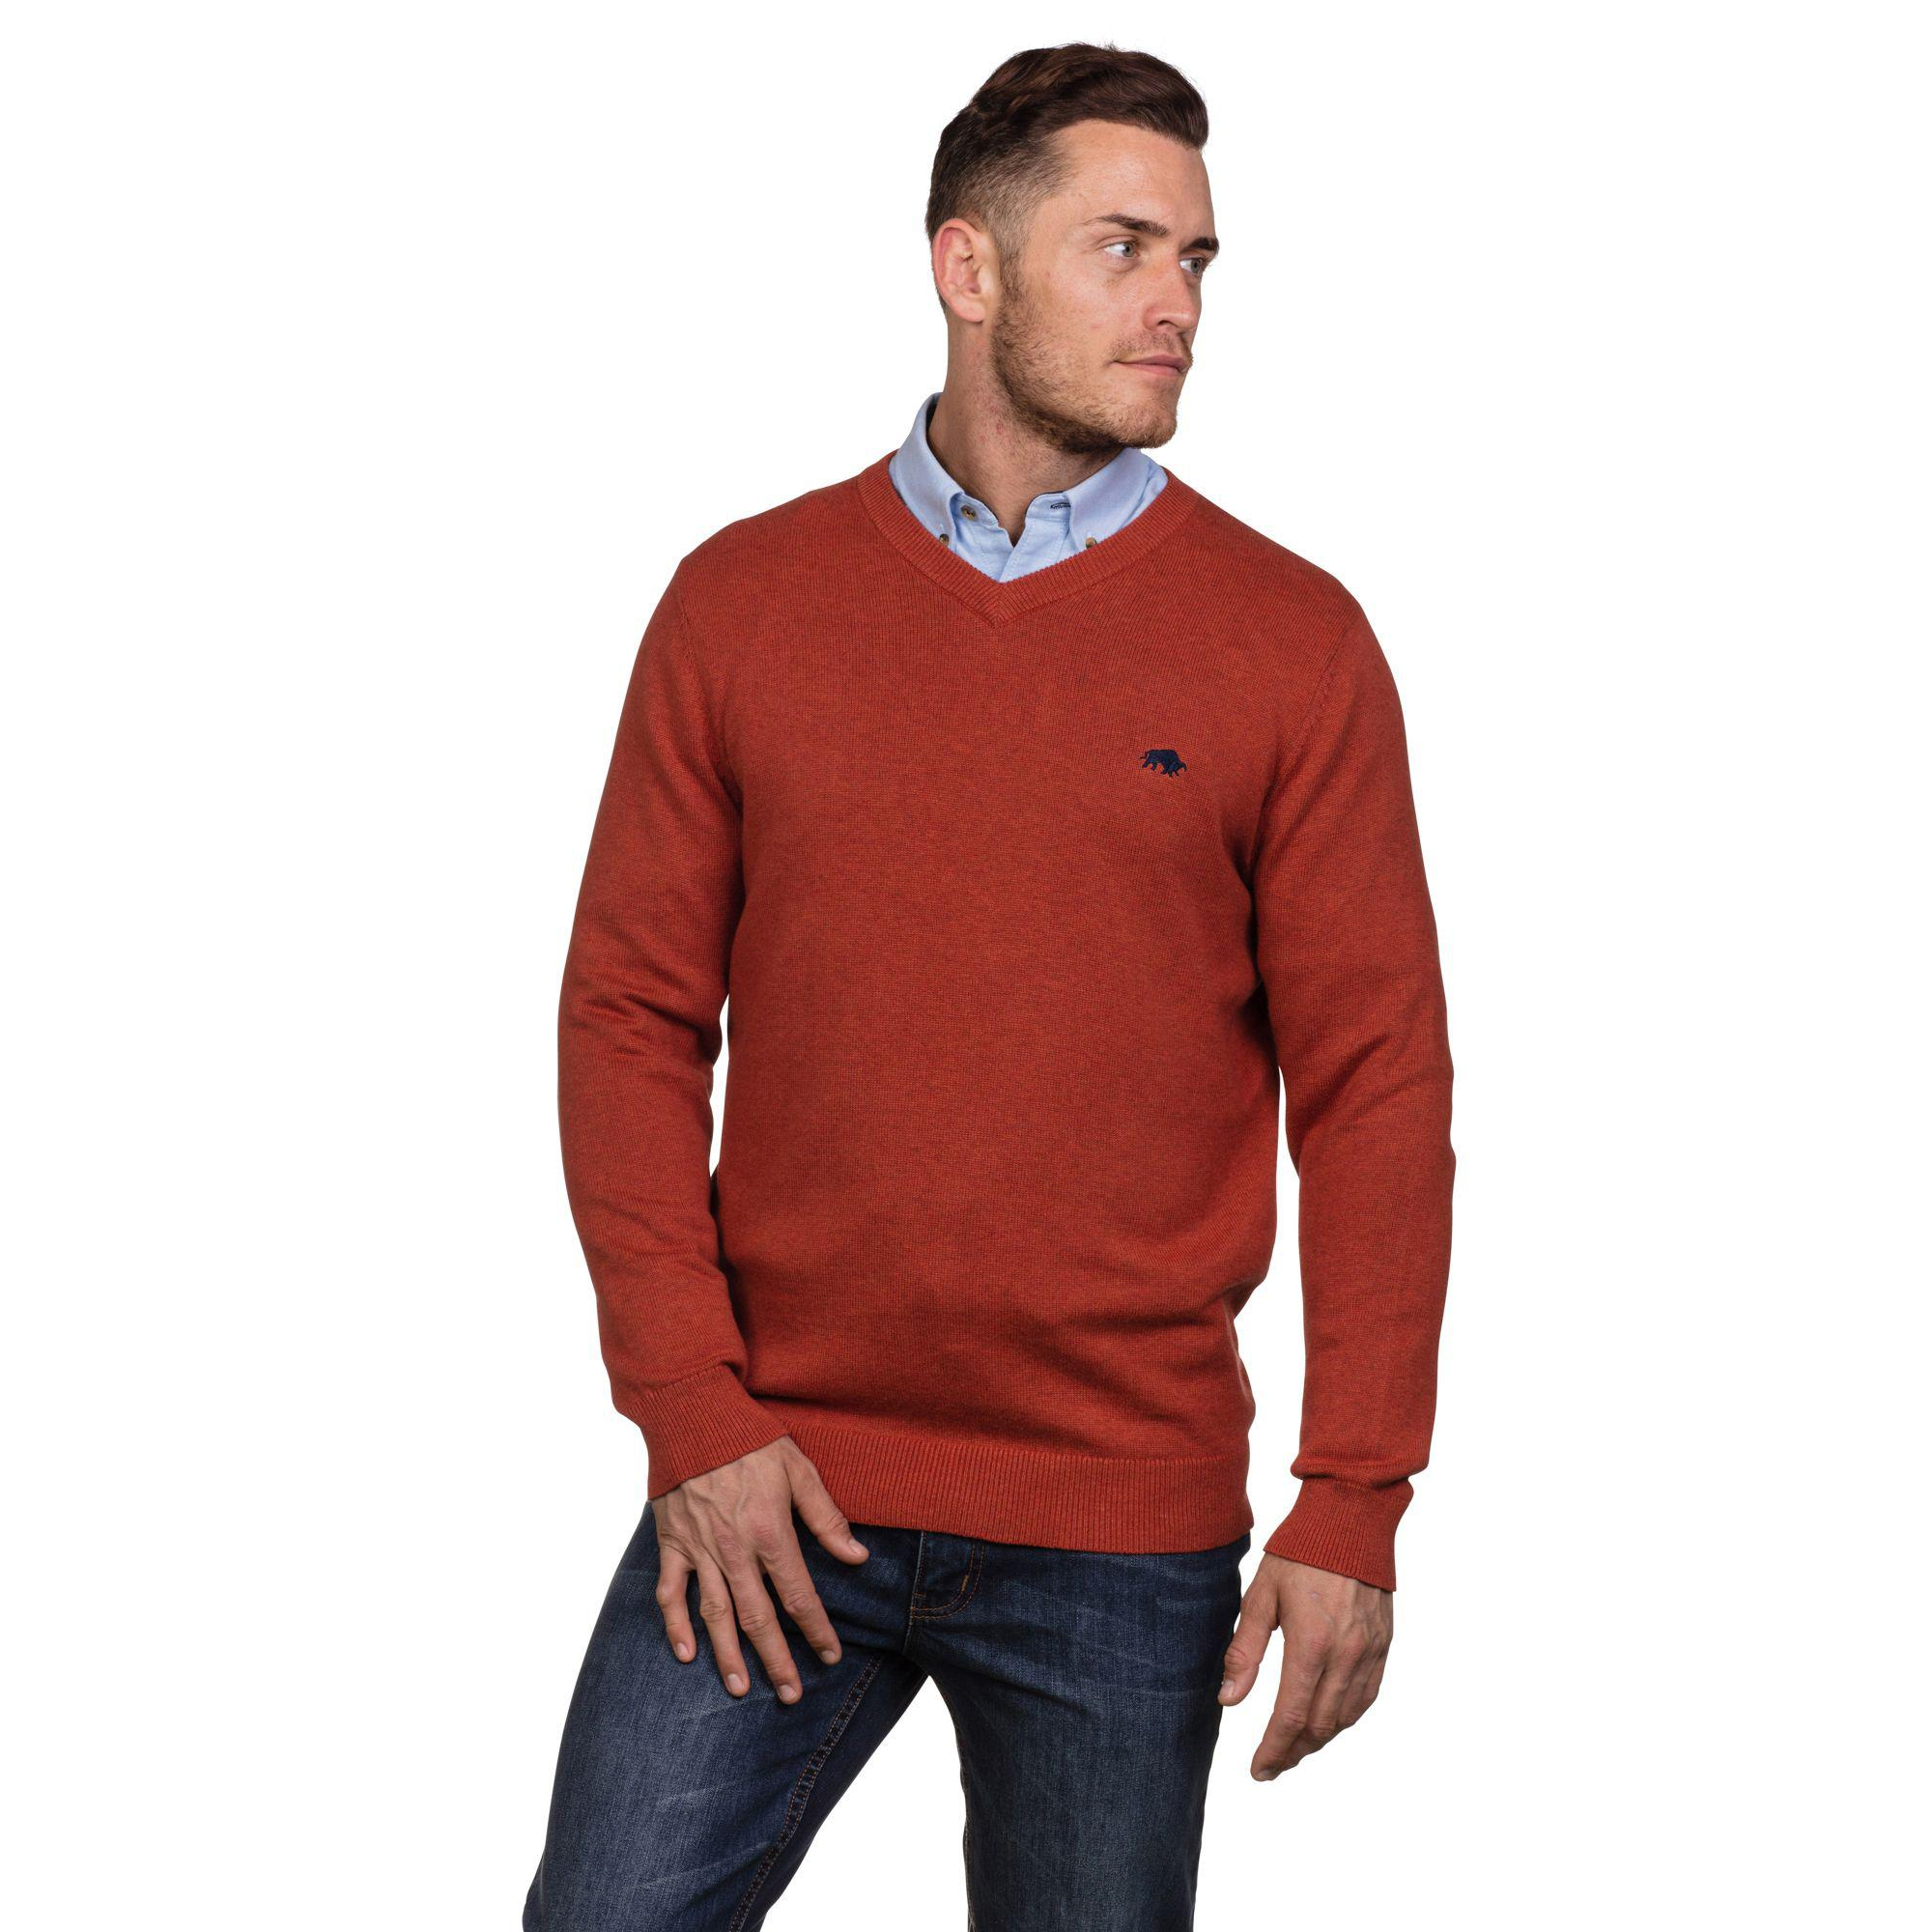 f8b04054c61567 Raging Bull - Orange V-neck Cotton And Cashmere Sweater for Men - Lyst.  View fullscreen